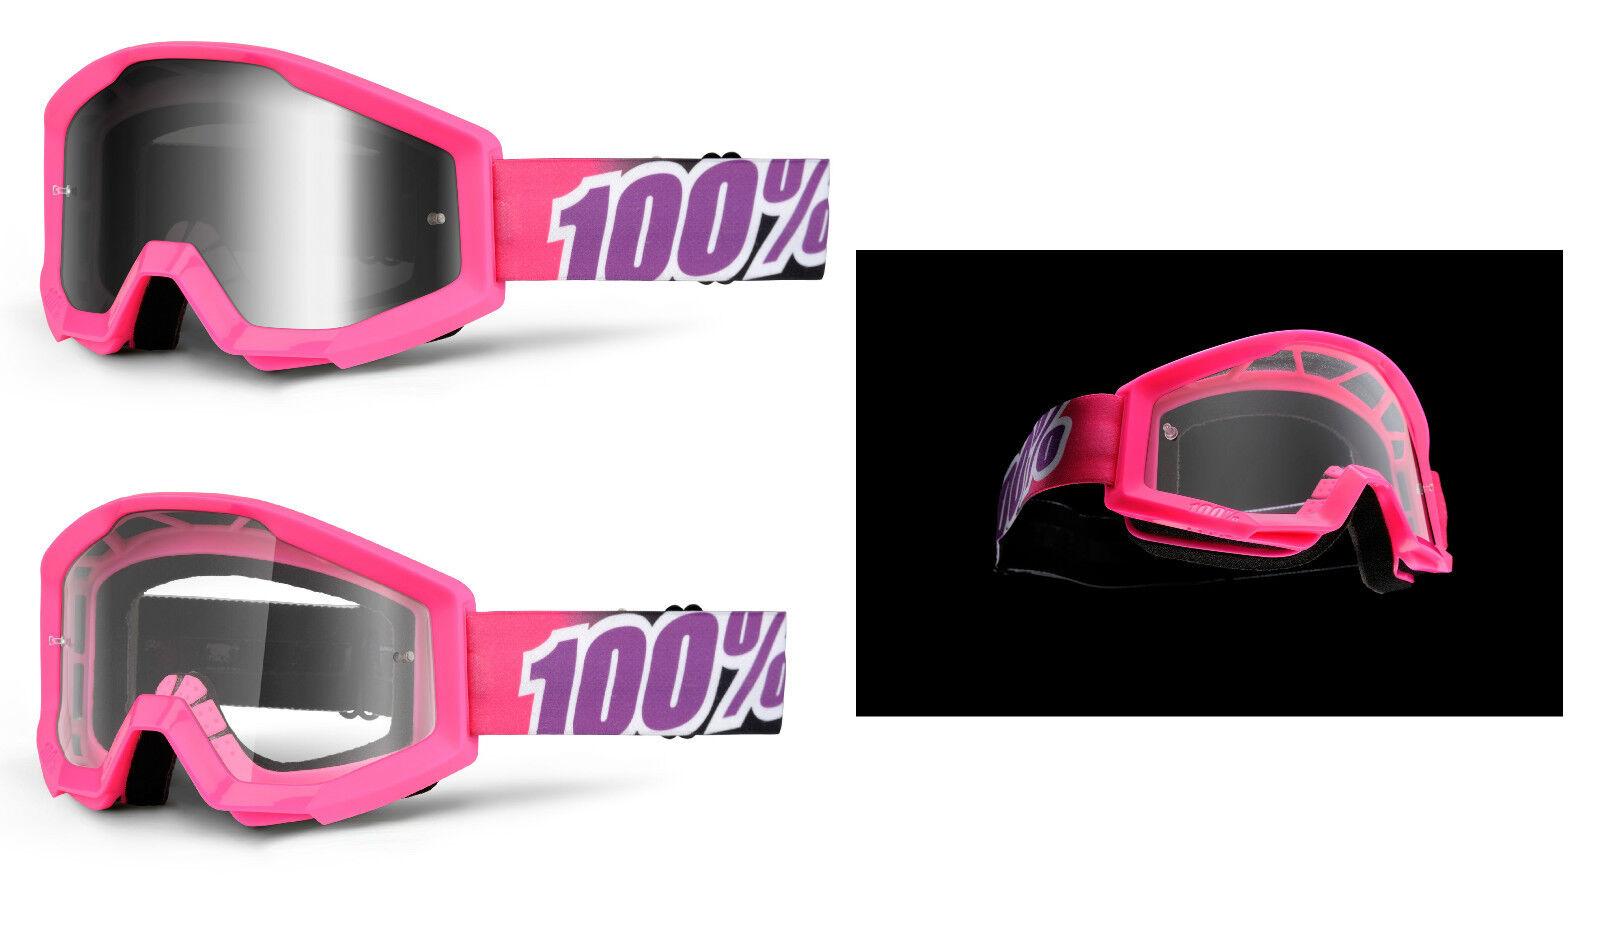 100% STRATA gafas 2016 Bubble Gum silver TIPO ESPEJO TRANSPARENTE MX Motocross